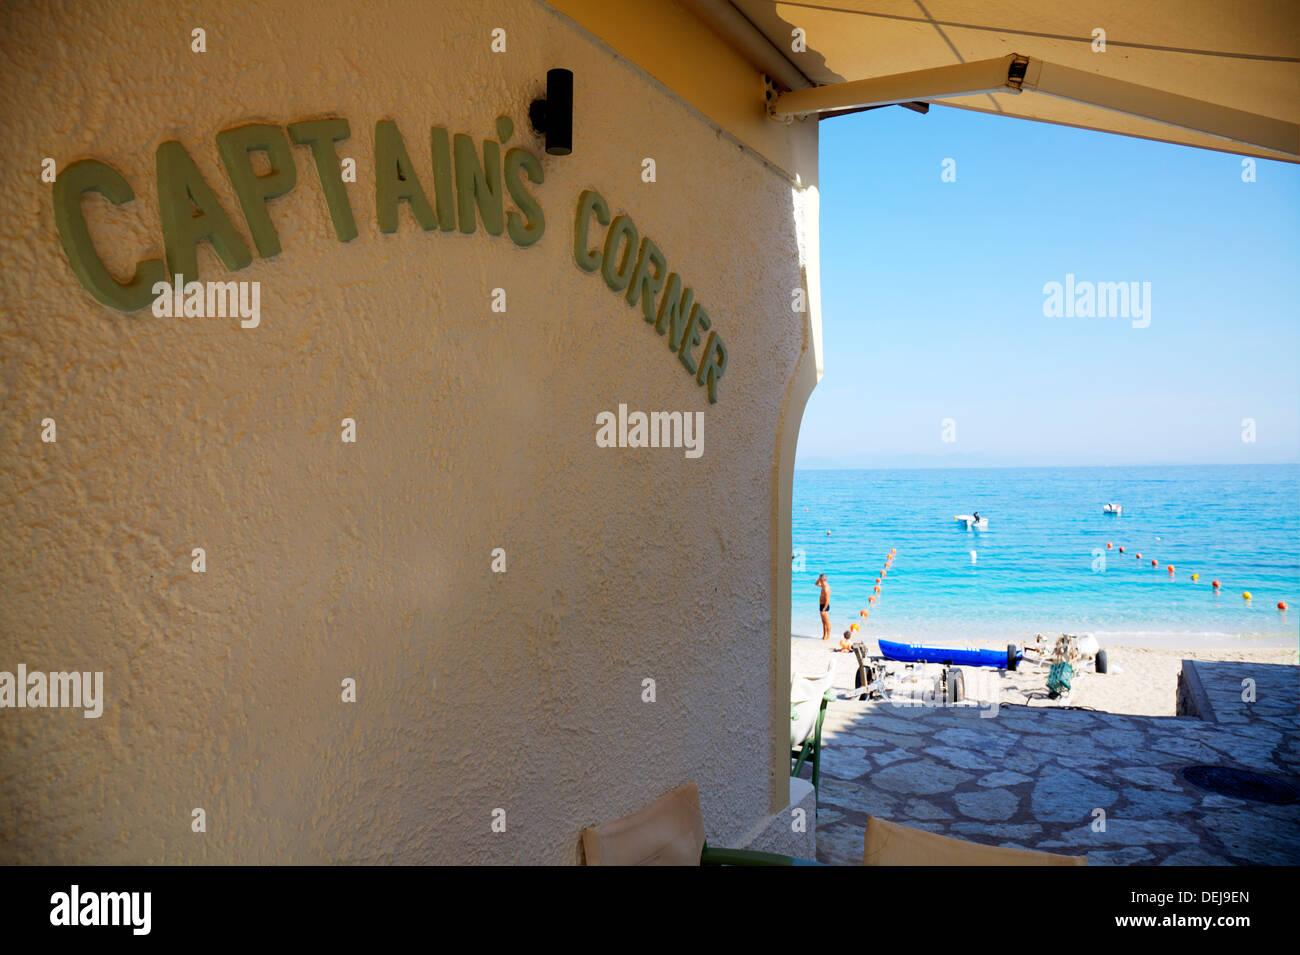 Agio ag Nikitas town captain's corner taverna overlooking beach sea coast Lefkas Lefkada Greek Island Greece - Stock Image